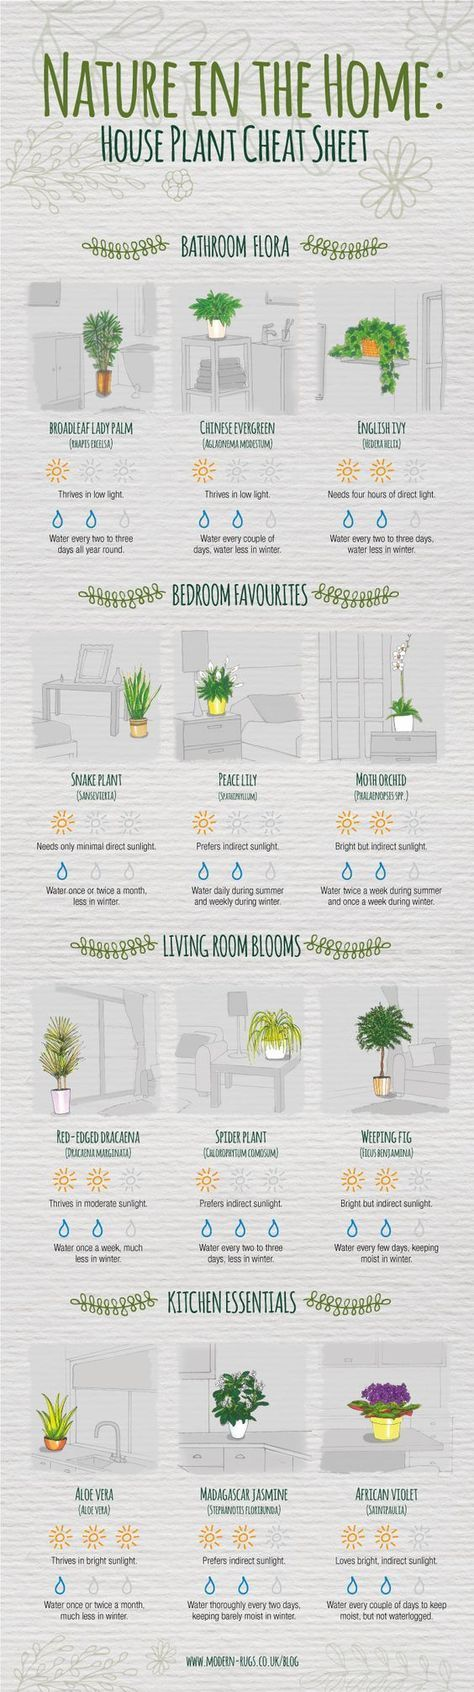 Photo of Houseplants Cheat Sheets #Infographic Houseplants Spick …